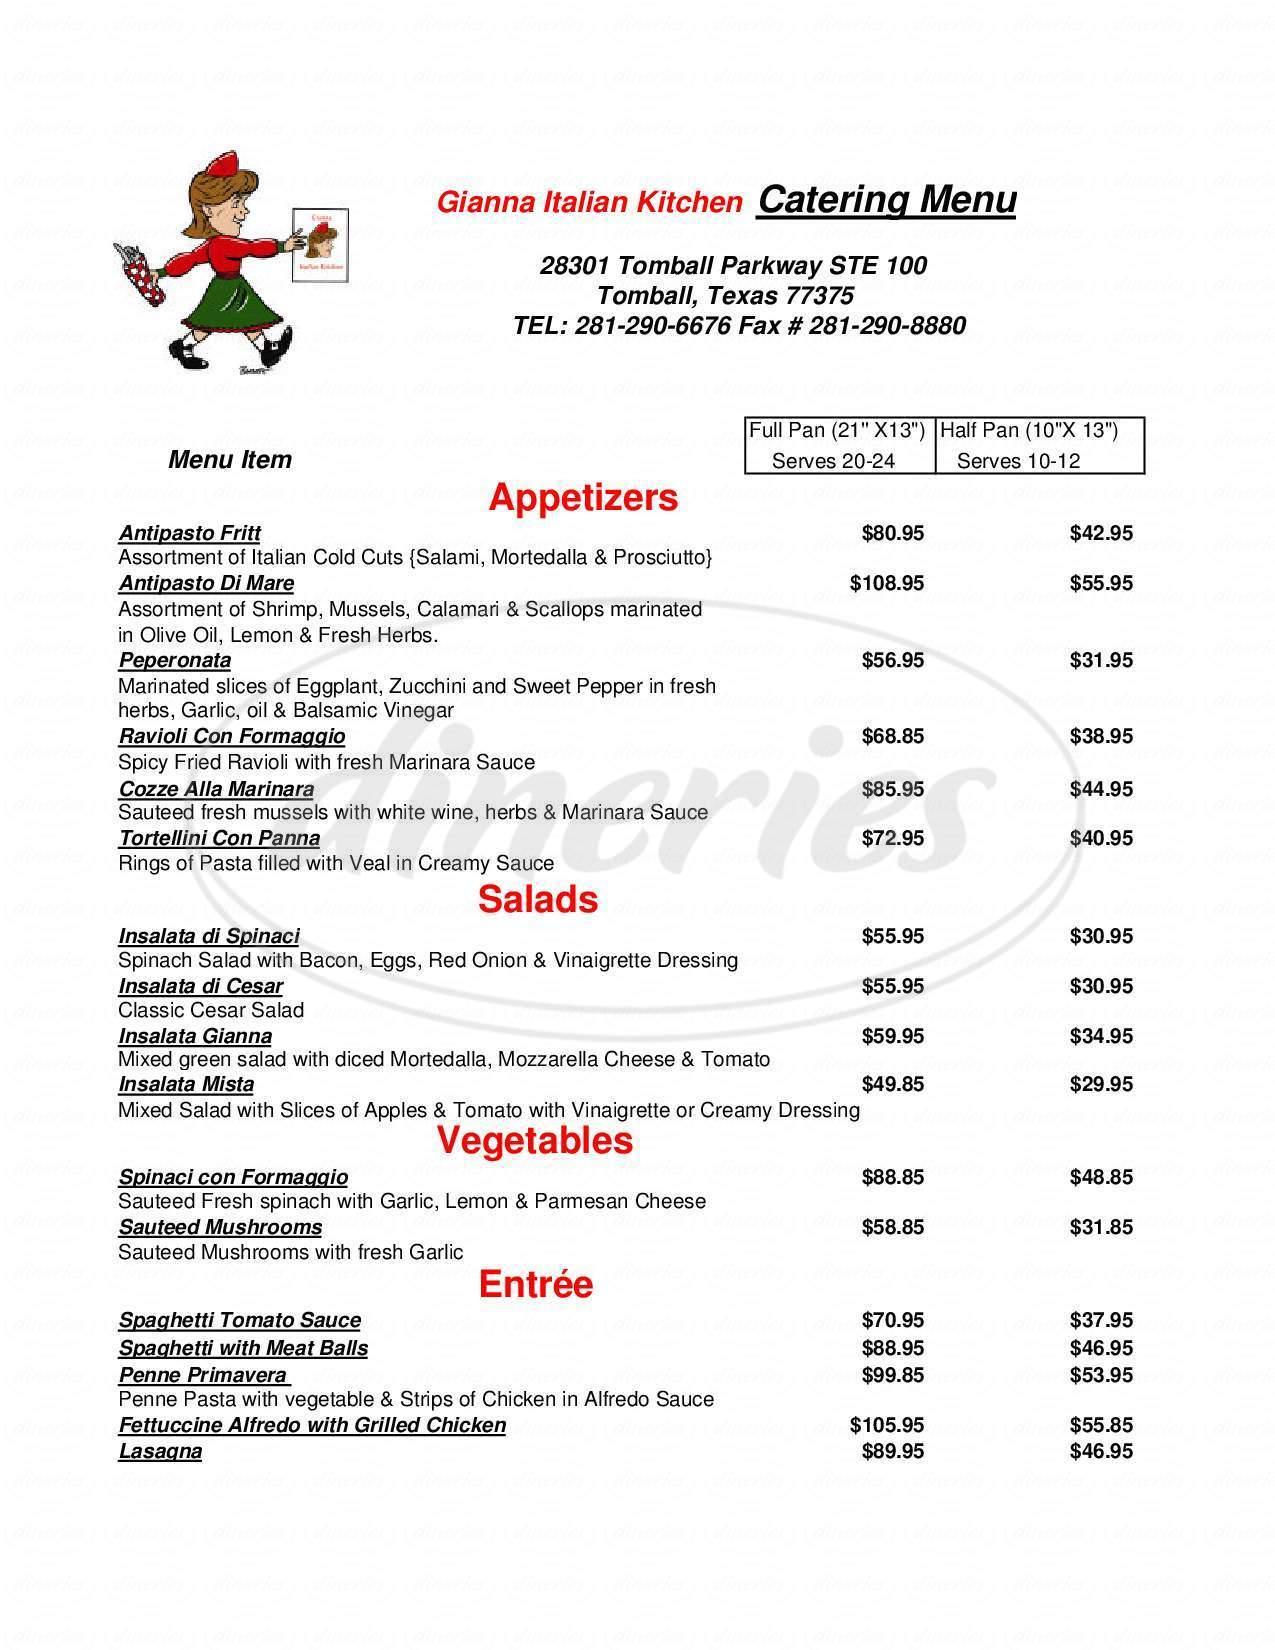 menu for Gianna Italian Kitchen